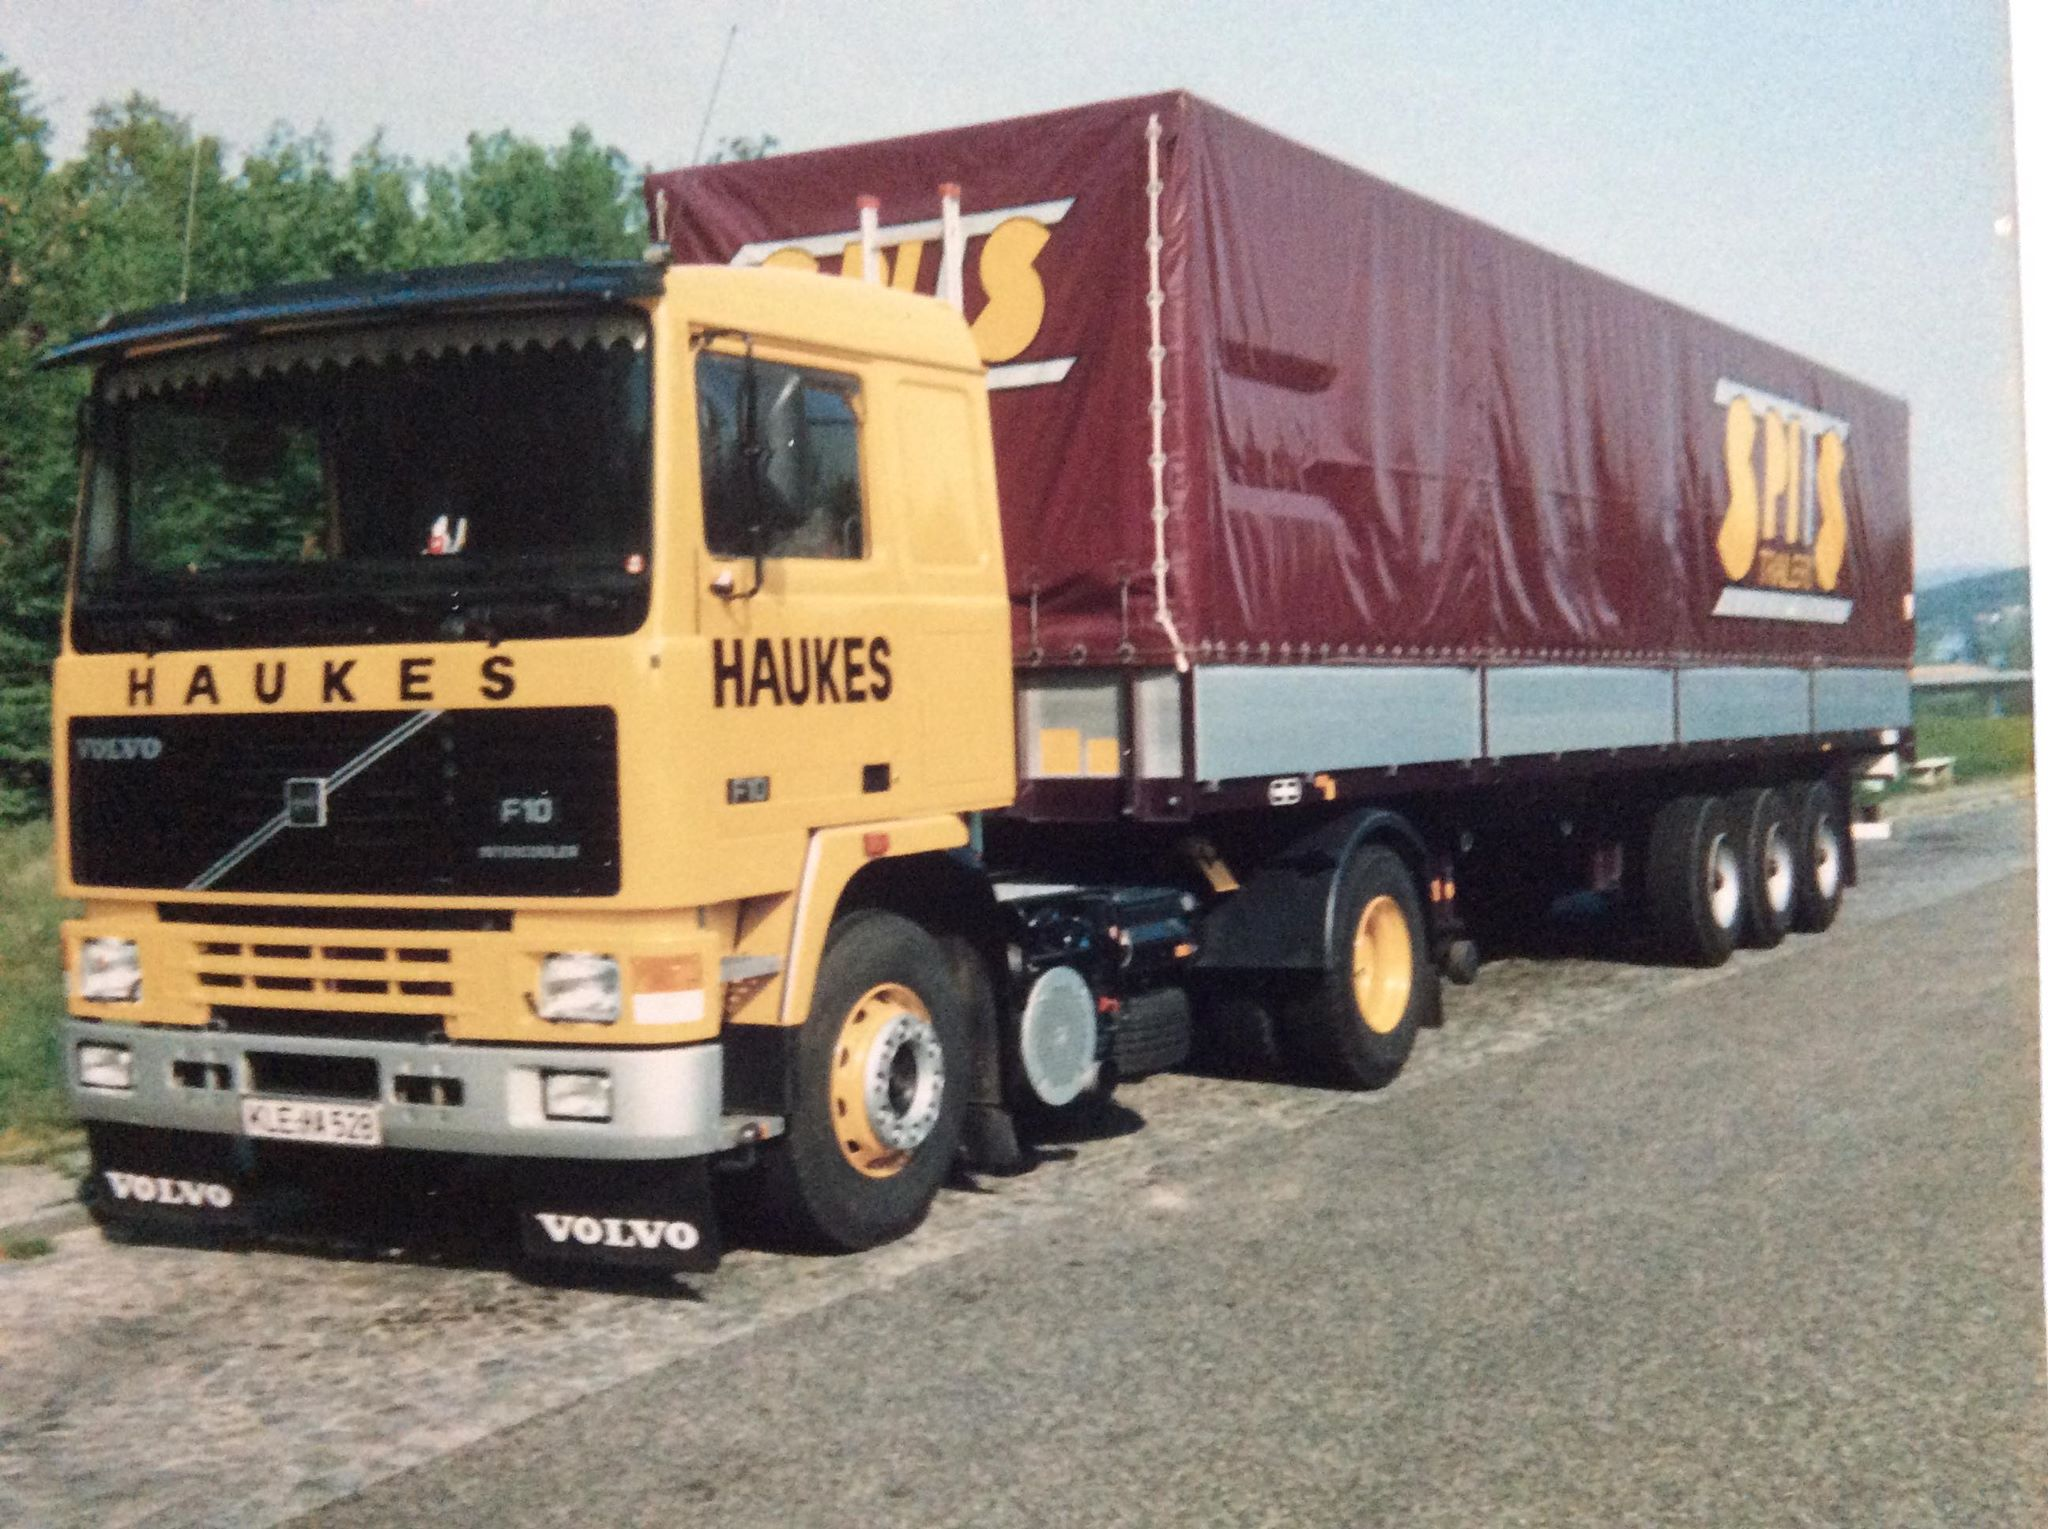 Volvo-Henk-Schmitjes-foto-archief-35